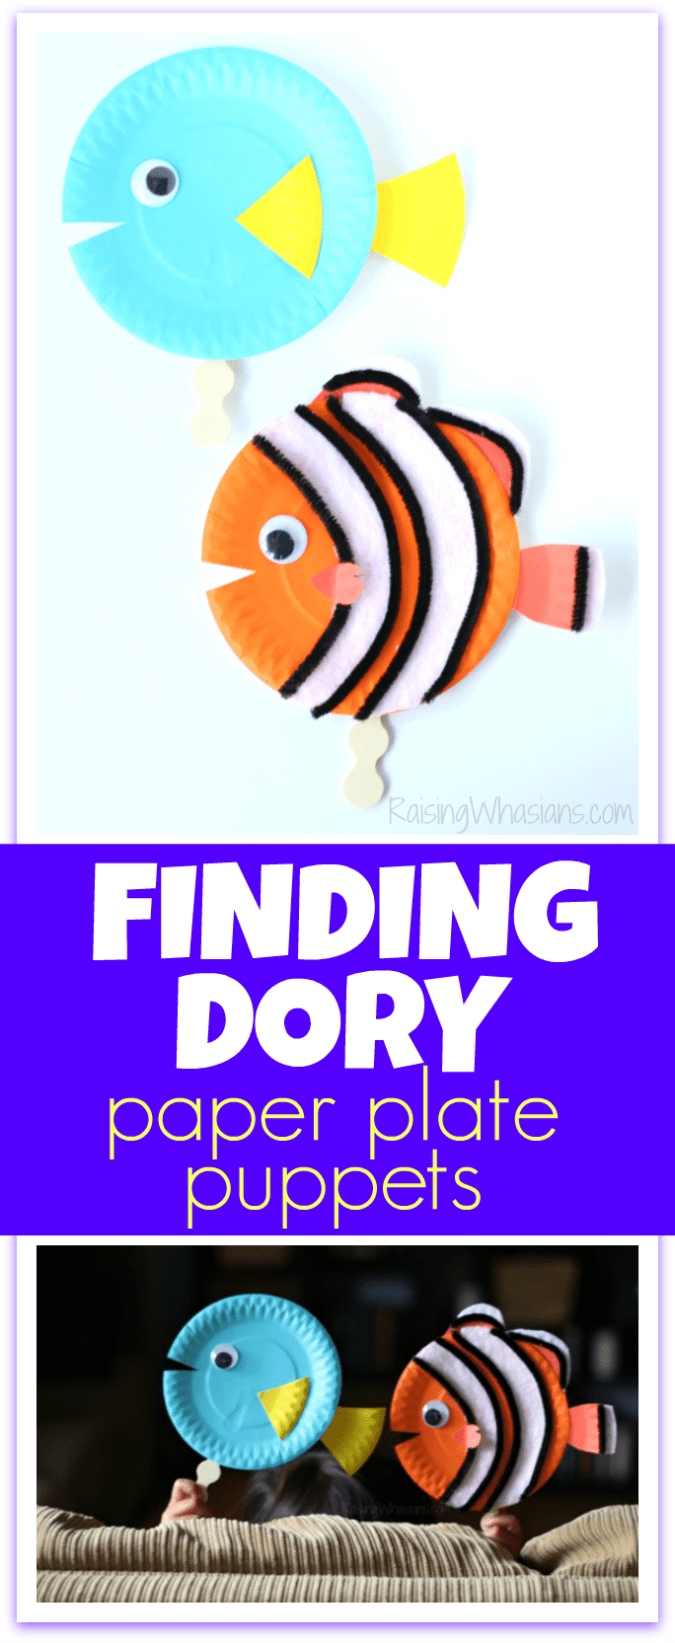 Finding Dory craft paper plate puppets Finding Dory Craft Paper Plate Puppets #FindingDoryEvent | Easy DIY Finding Dory Craft Idea with paper plates & Disney inspiration. Make Nemo & Dory #FindingNemo #FindingDory #Disney #Craft #PartyPlanning #DIY #DisneyParty #DisneyDIY